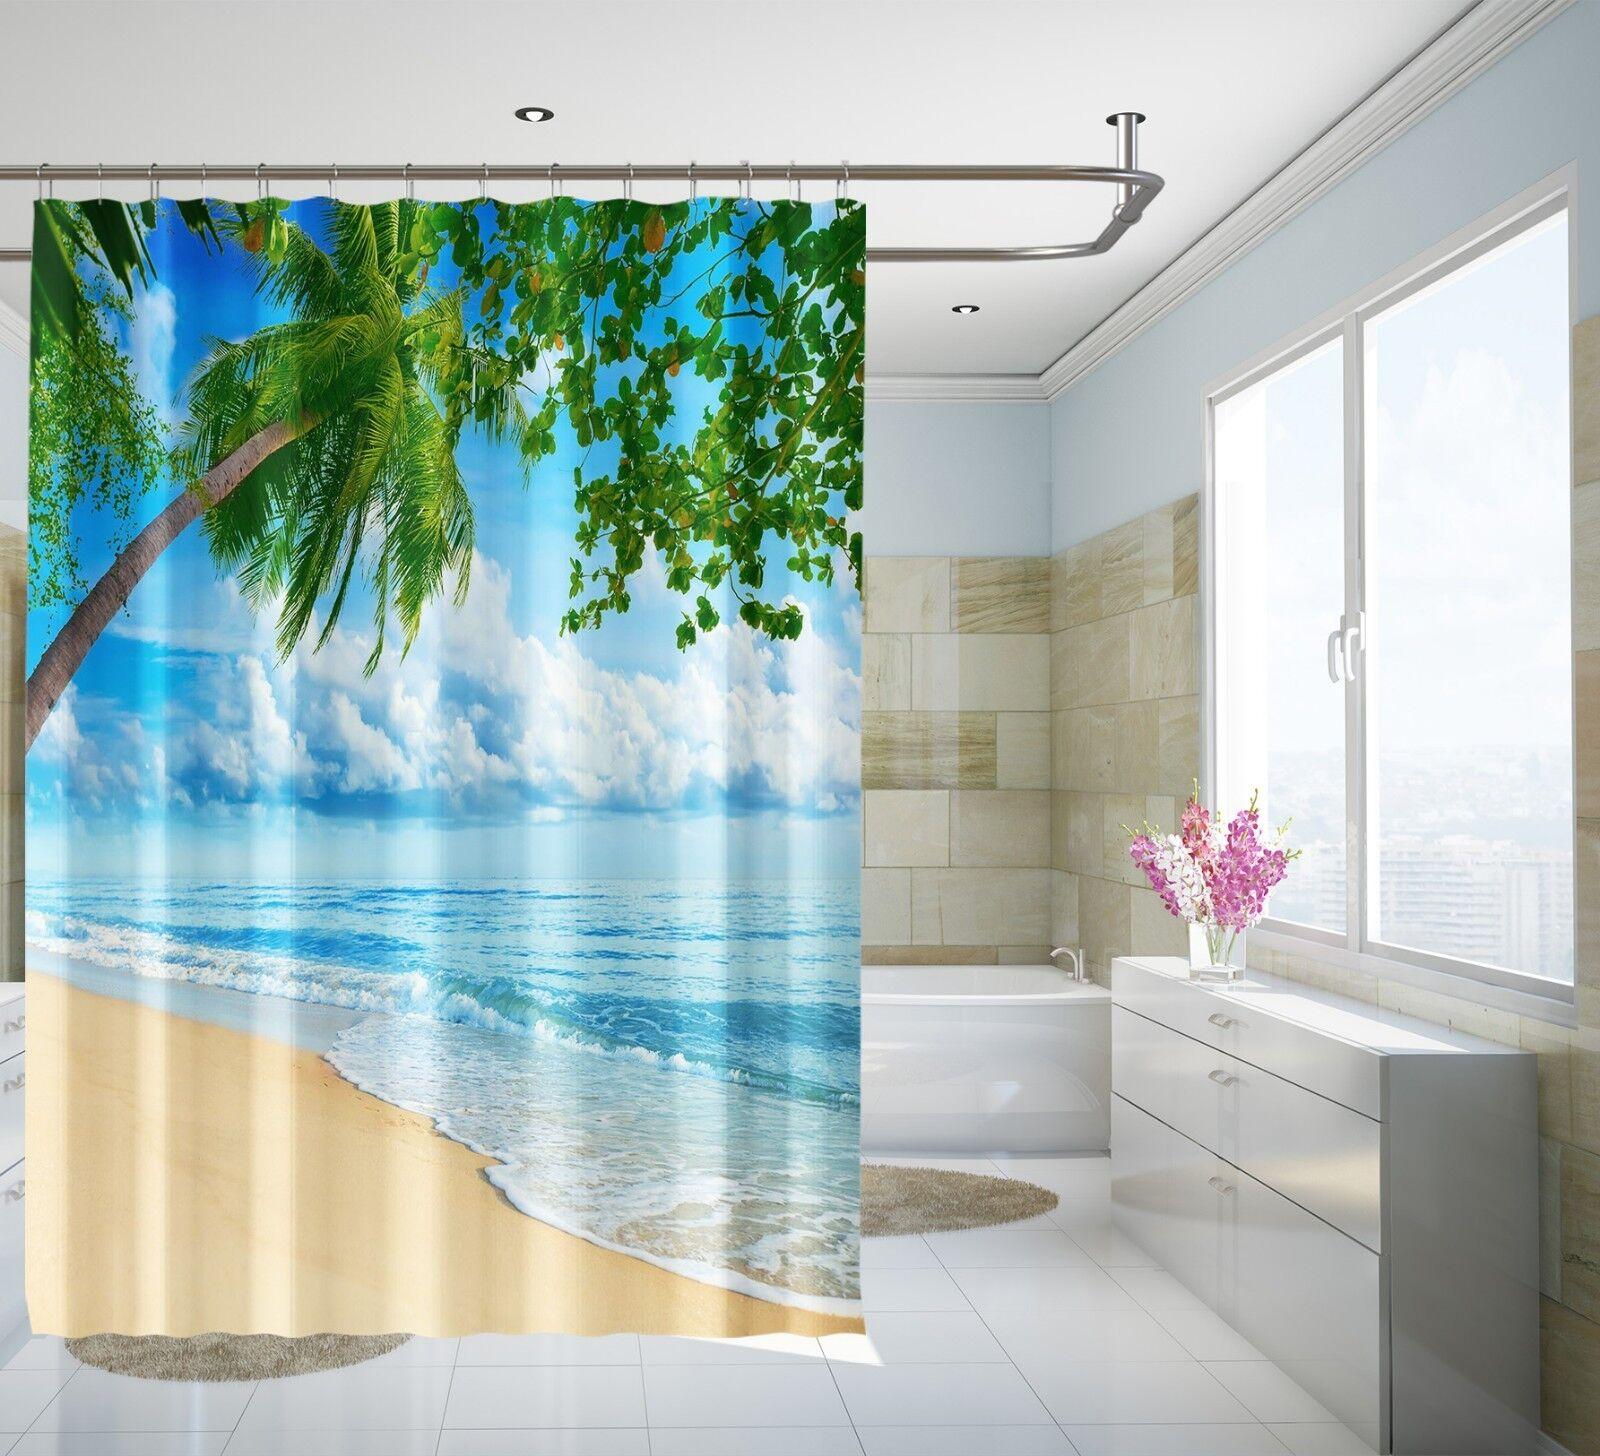 3D Beach Scape 5 Shower Curtain Waterproof Fiber Bathroom Home Home Home Windows Toilet 25b601